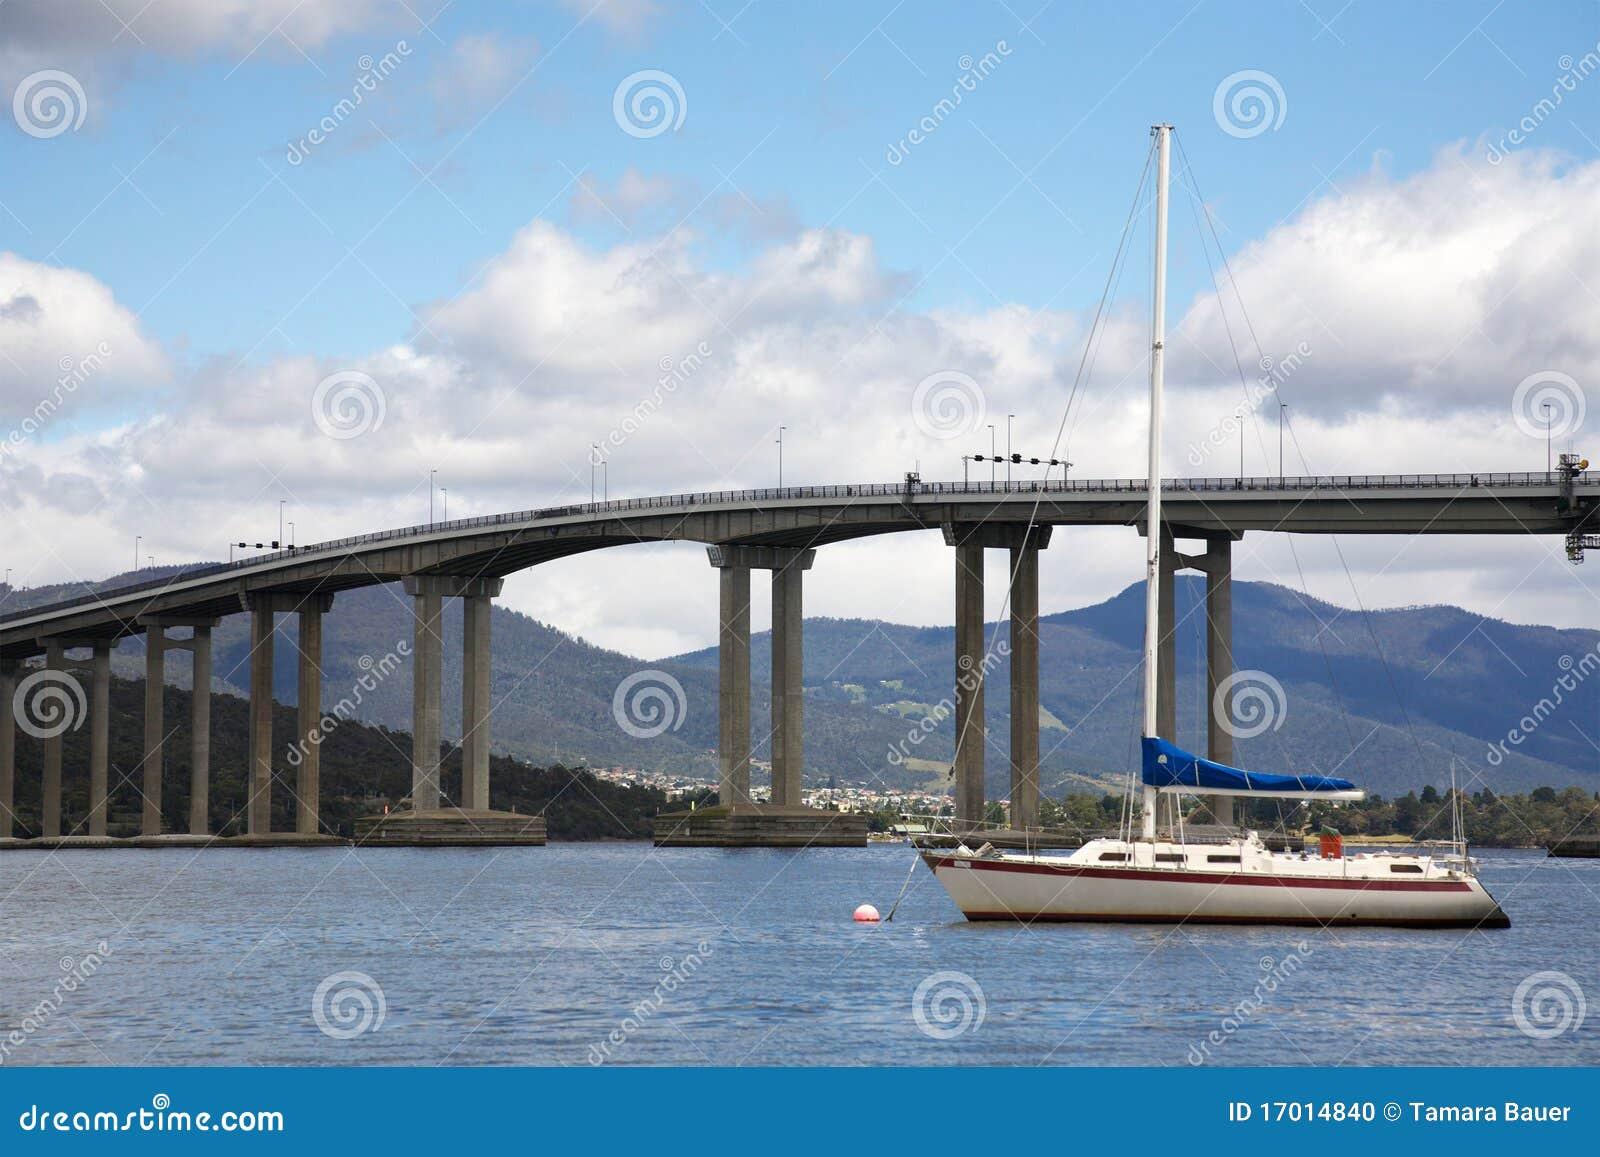 tasman bridge in hobart city stock photo image 17014840. Black Bedroom Furniture Sets. Home Design Ideas